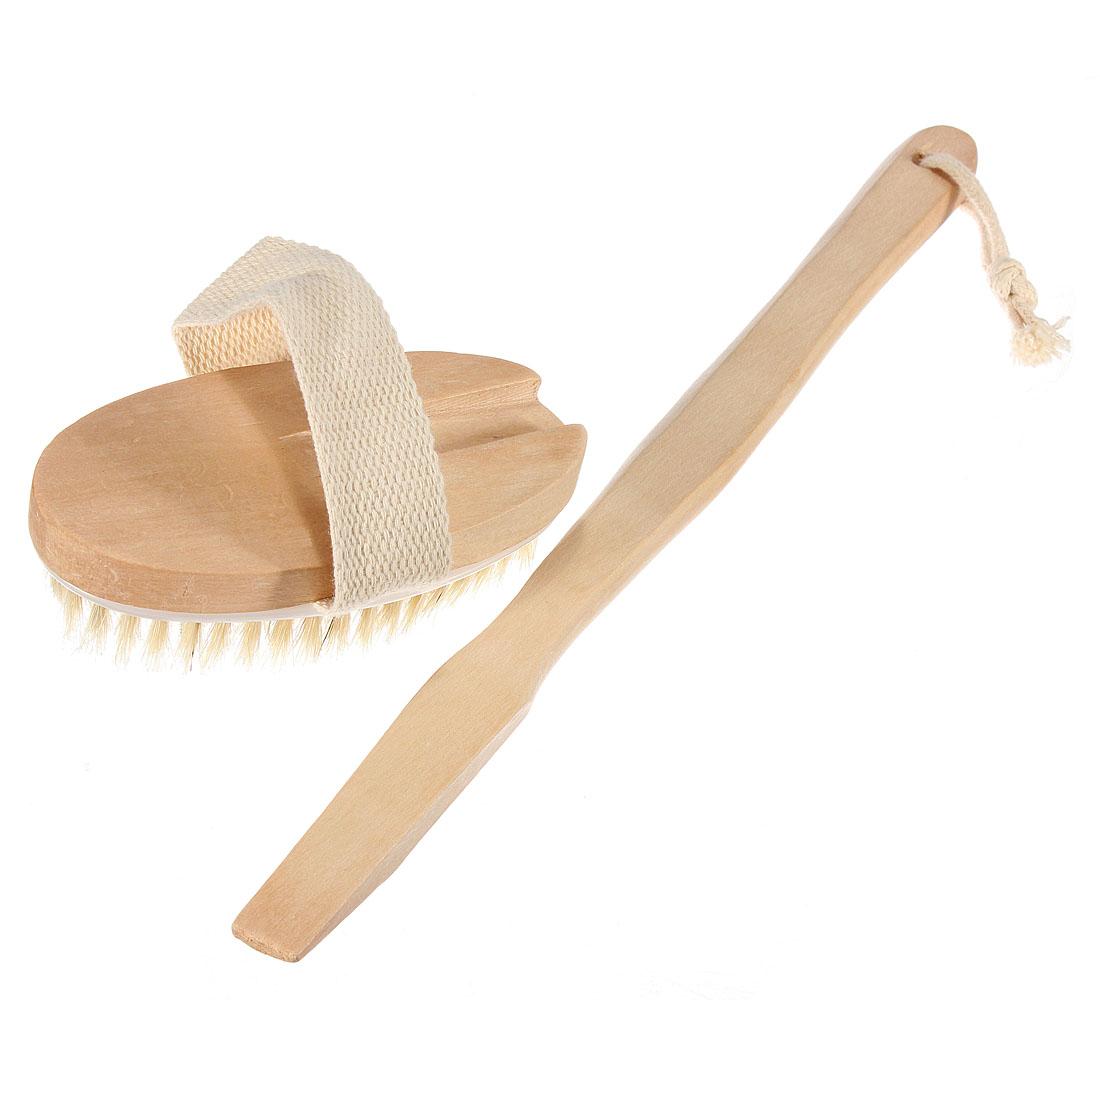 Wooden Body Brush Massager Bath Shower Back Spa Scrubber